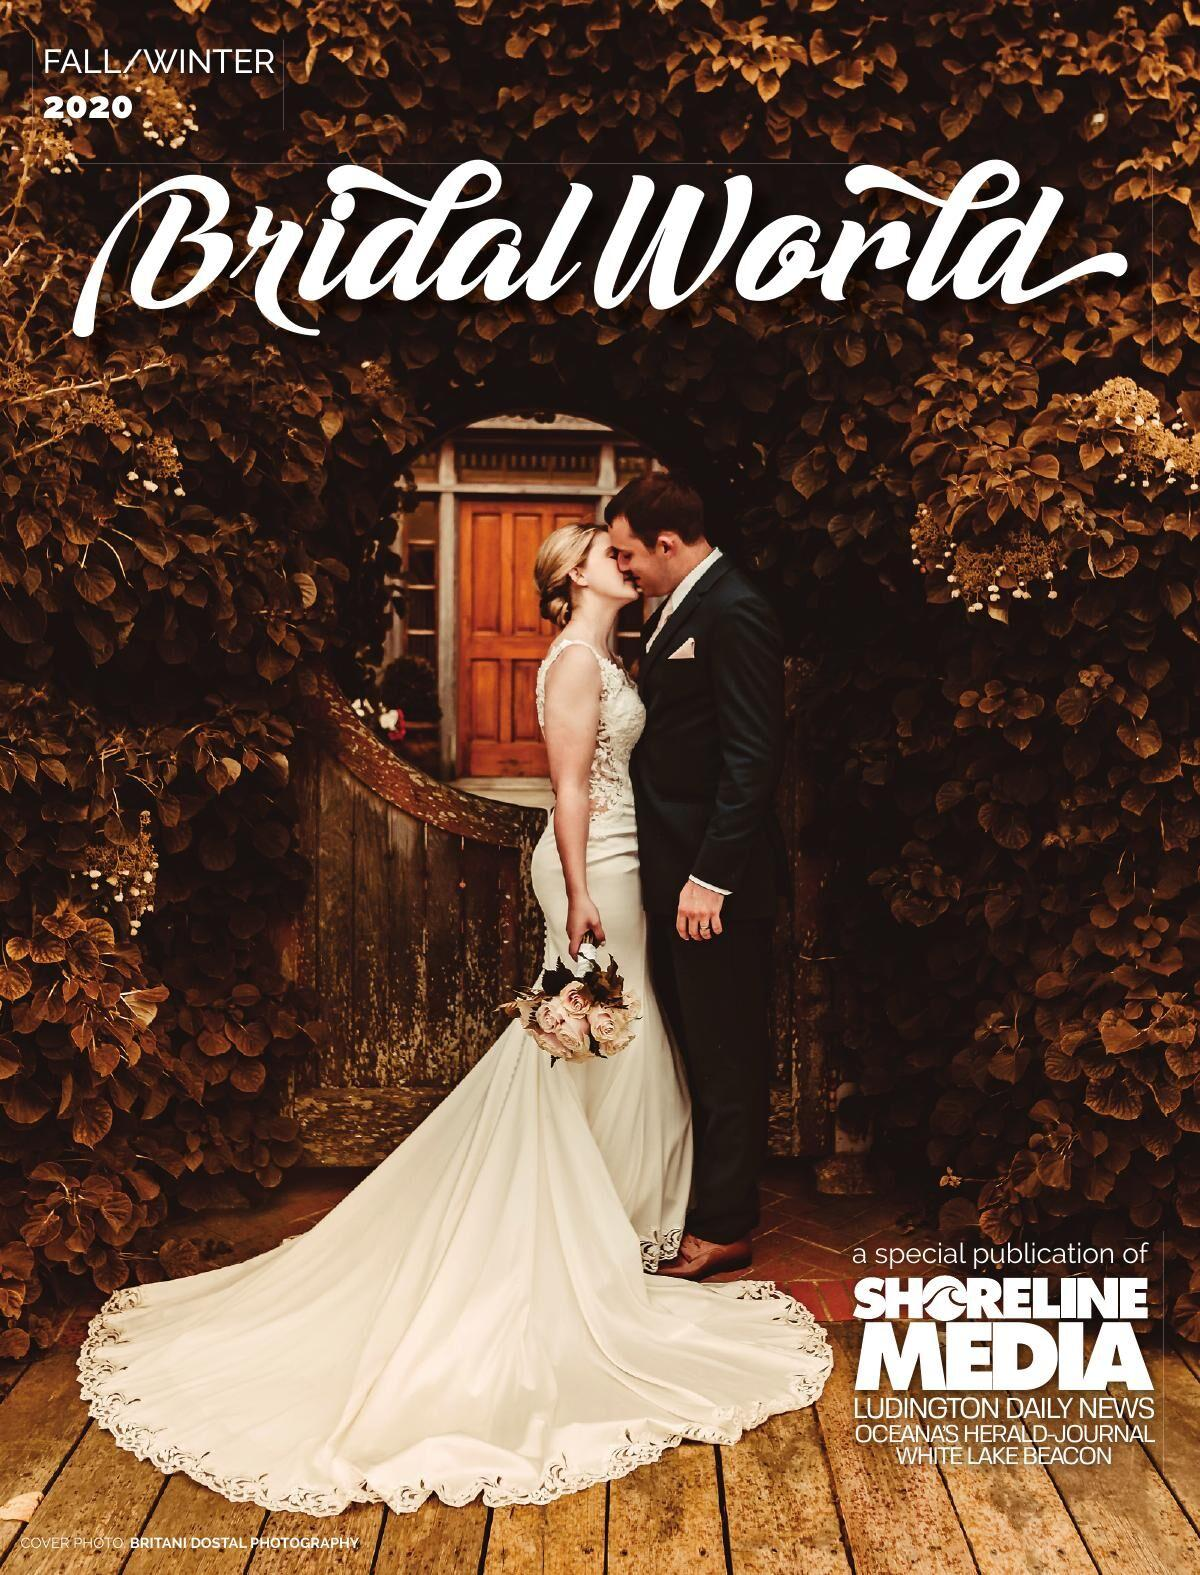 Bridal World 2020 Fall/Winter